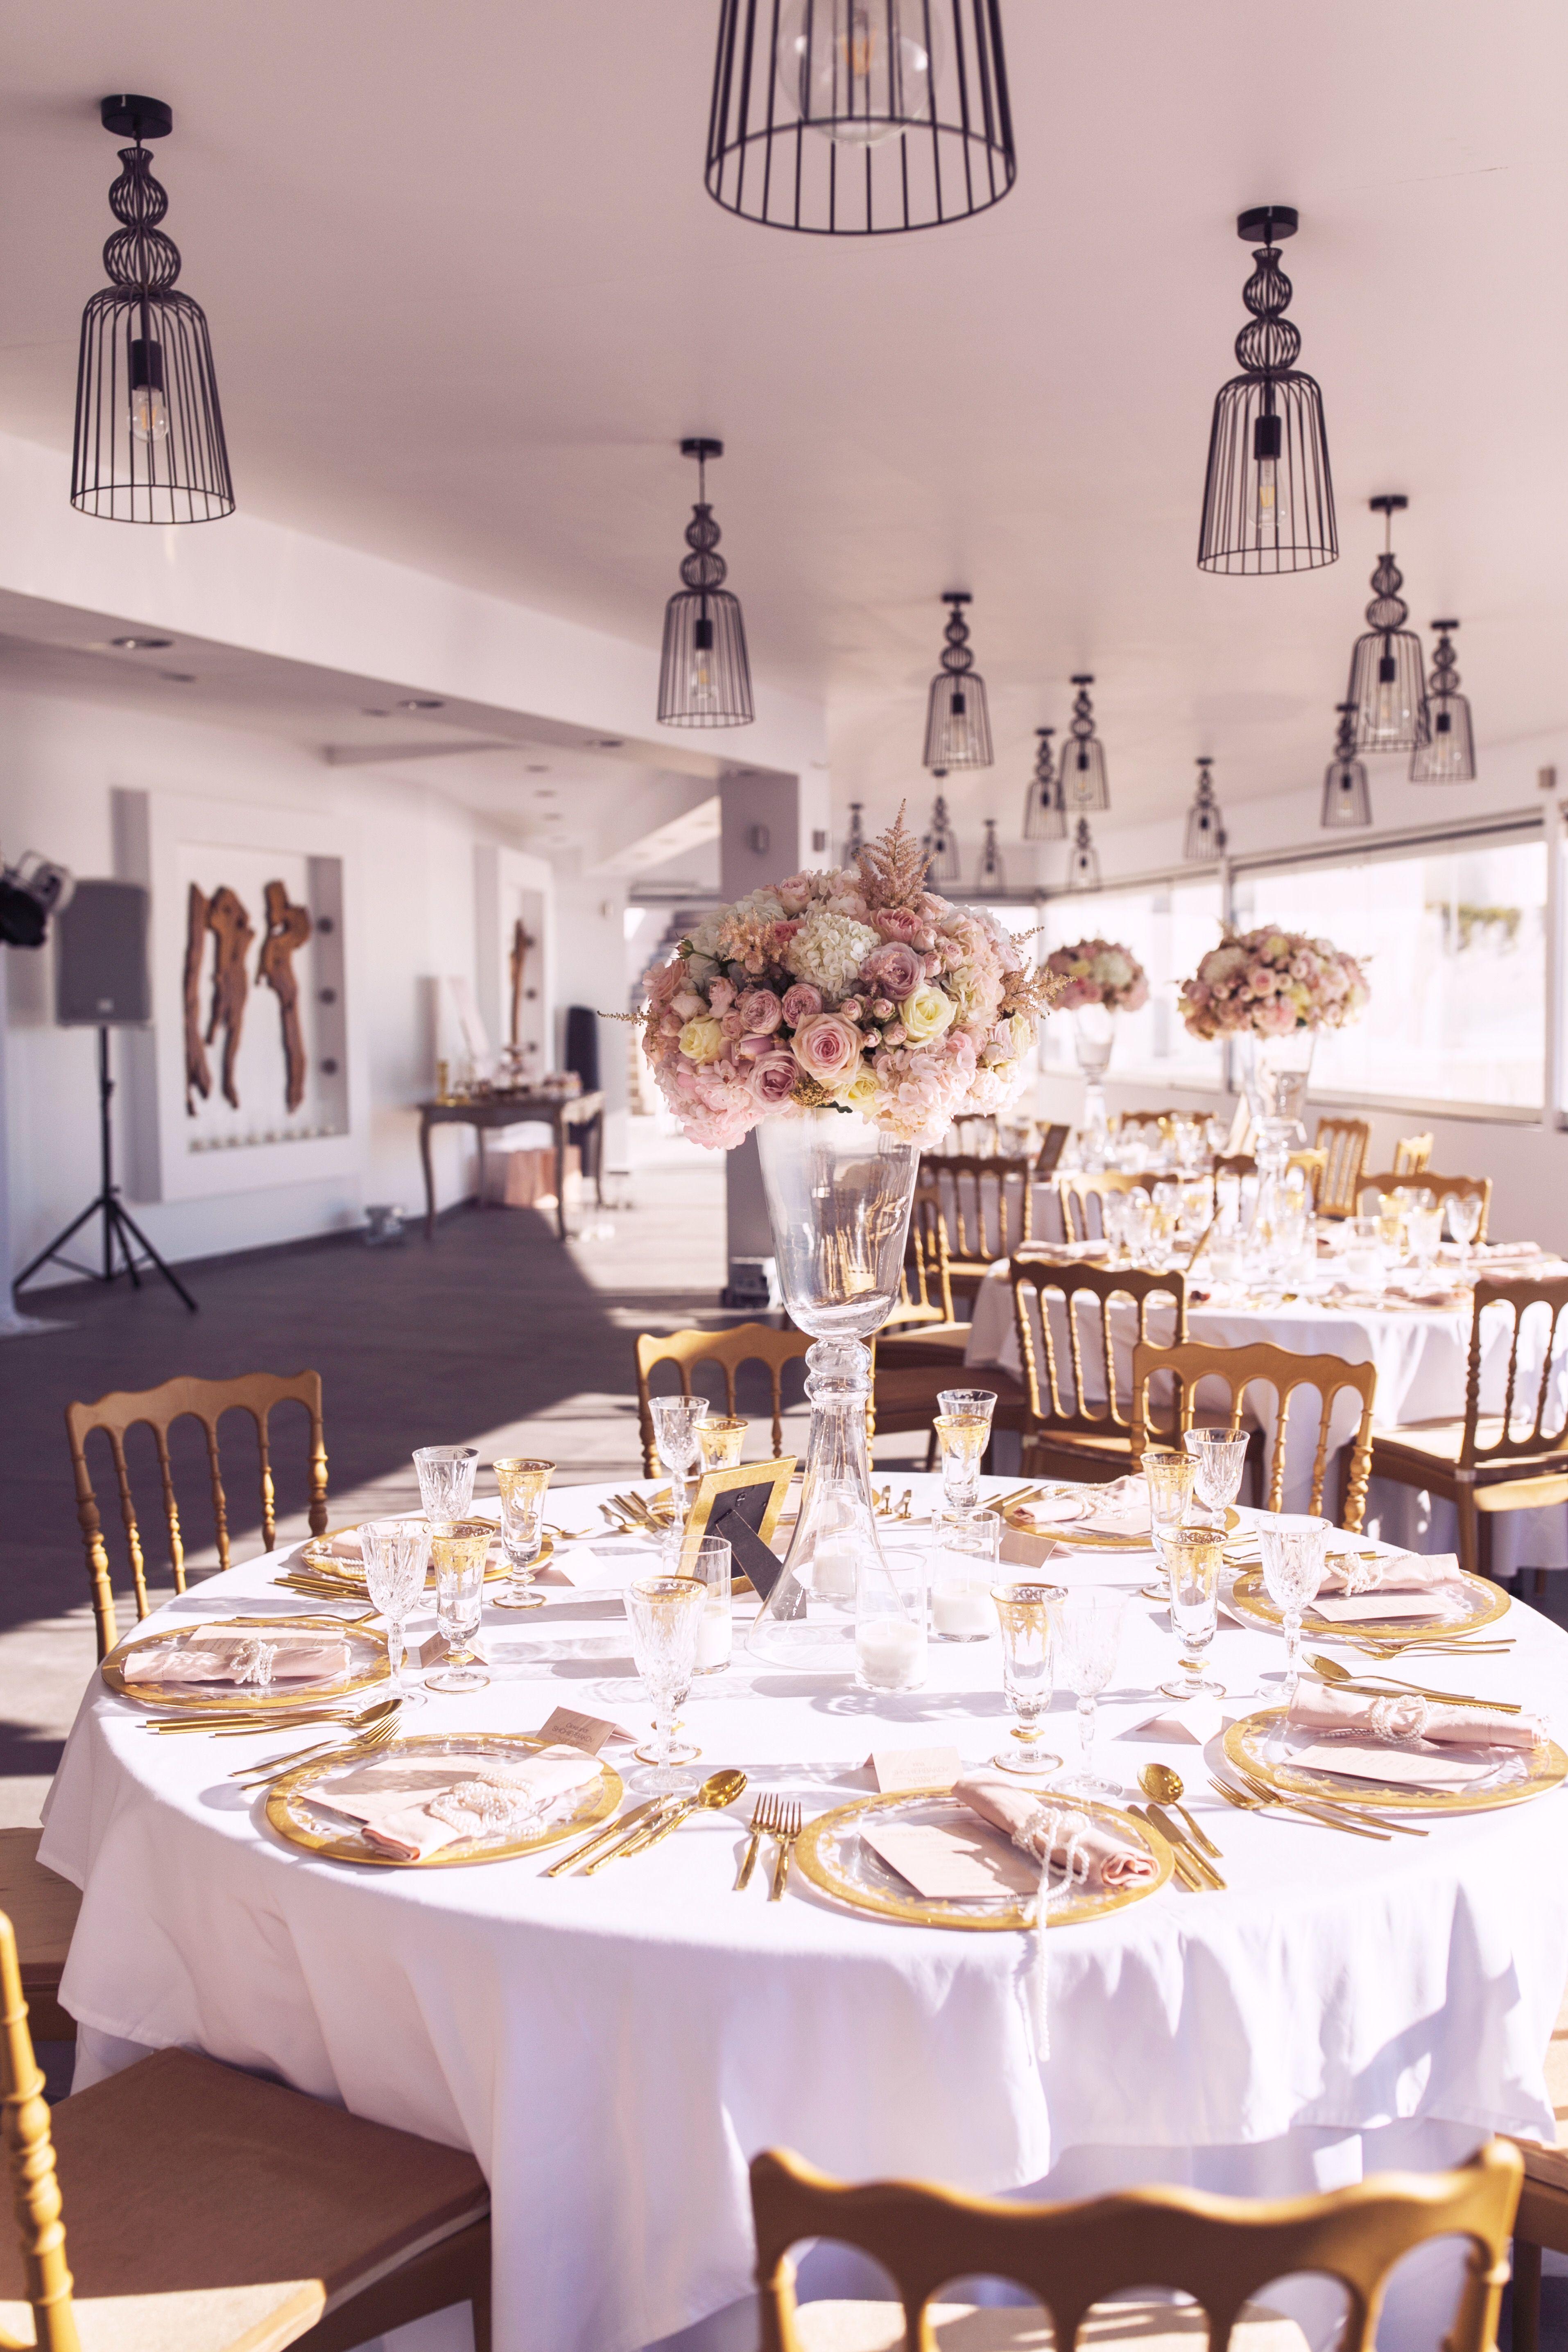 Santo Wines Winery Santorini Greece Perfect Wedding Venue With